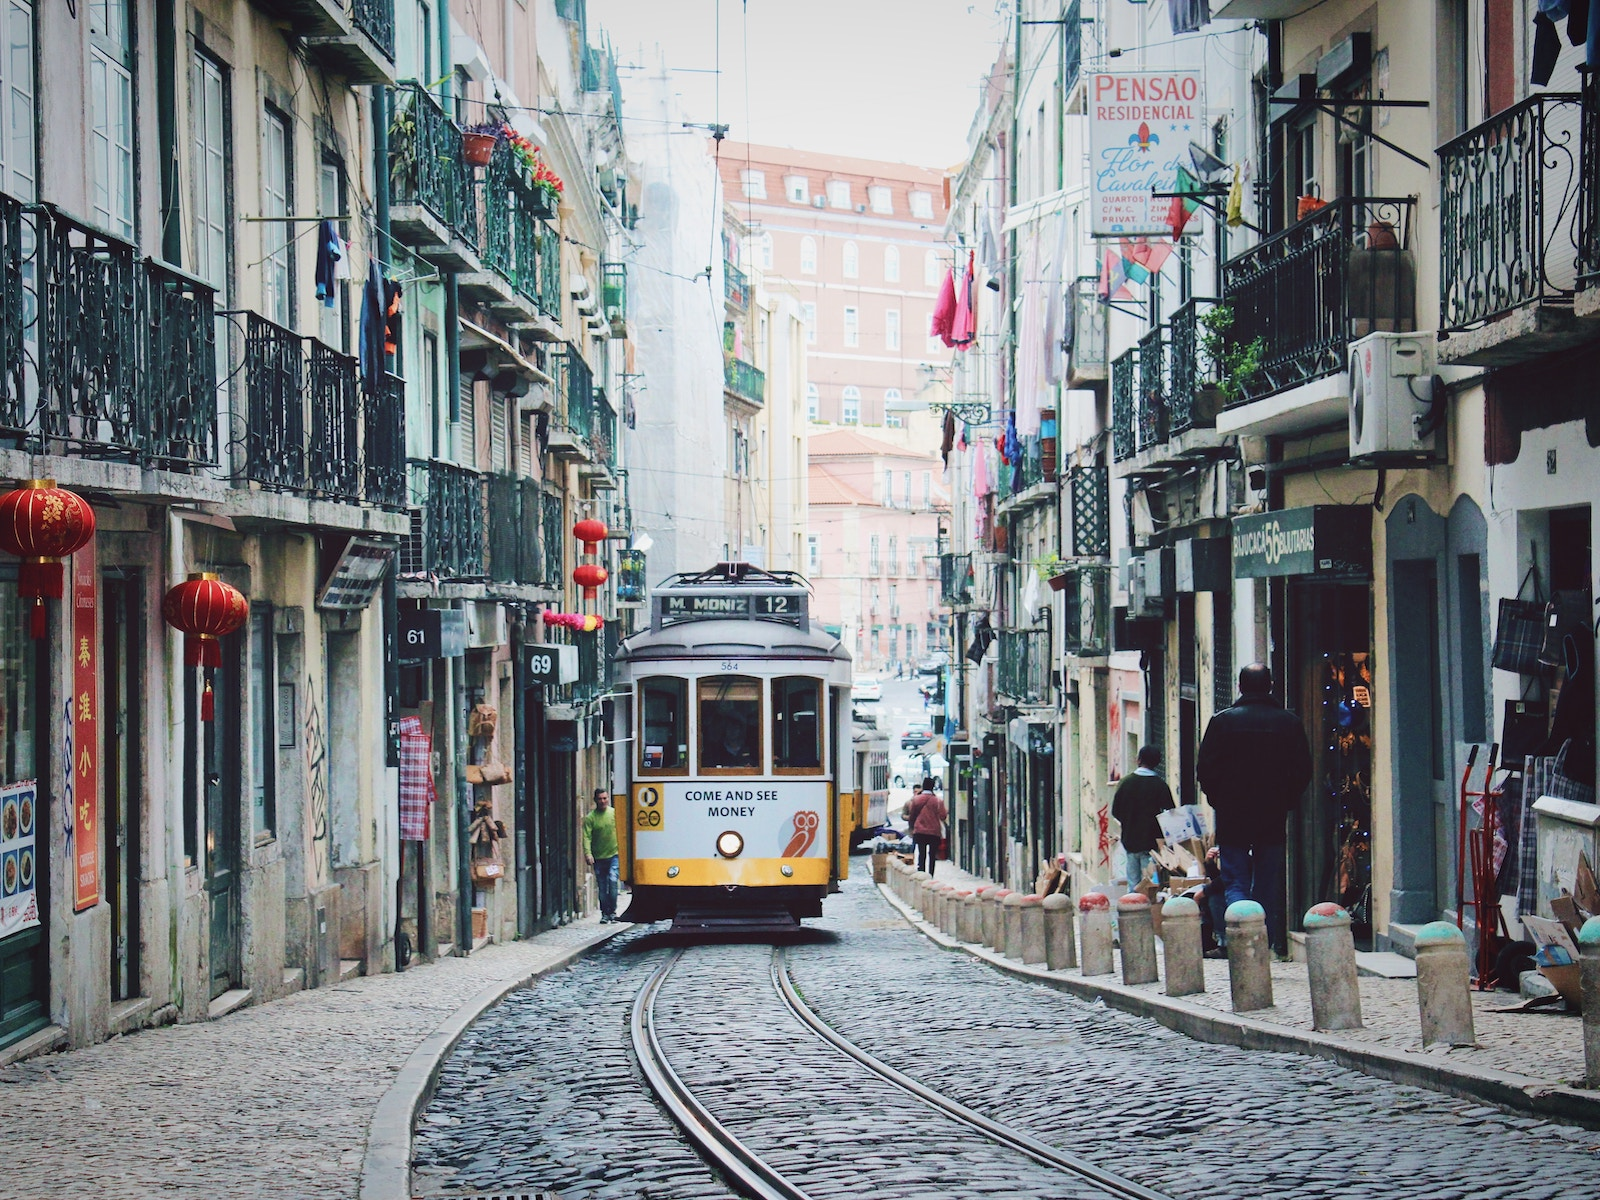 stedentrip Lissabon